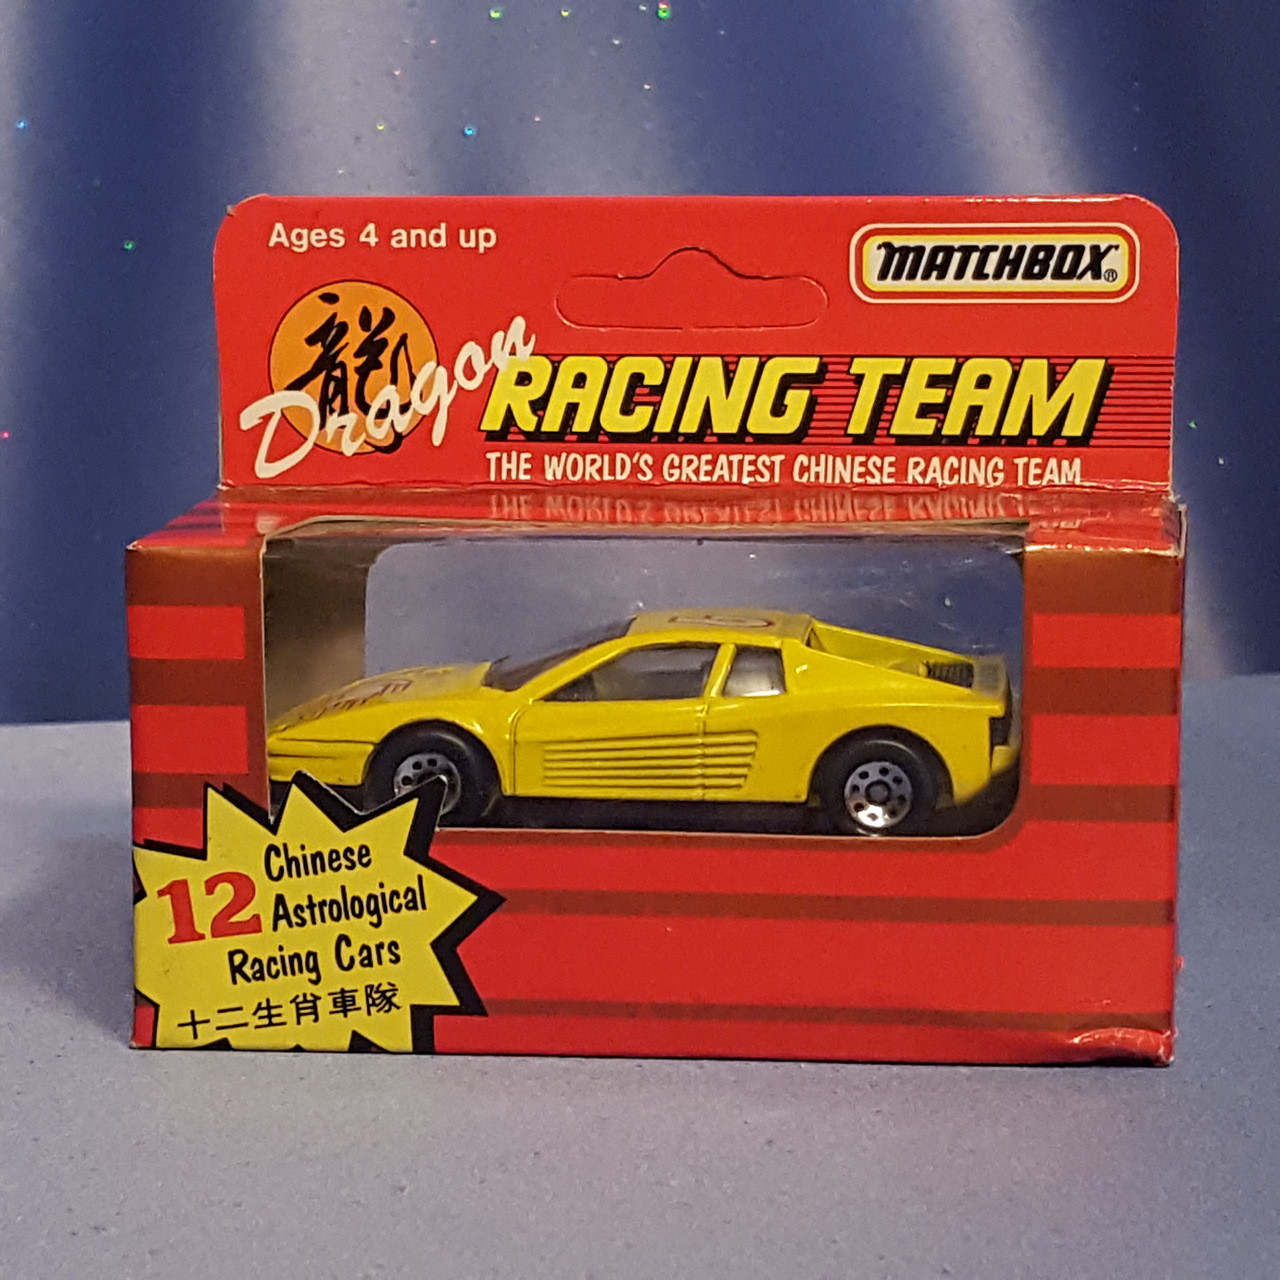 Ferrari Testarossa - Dragon Racing Team by Matchbox.